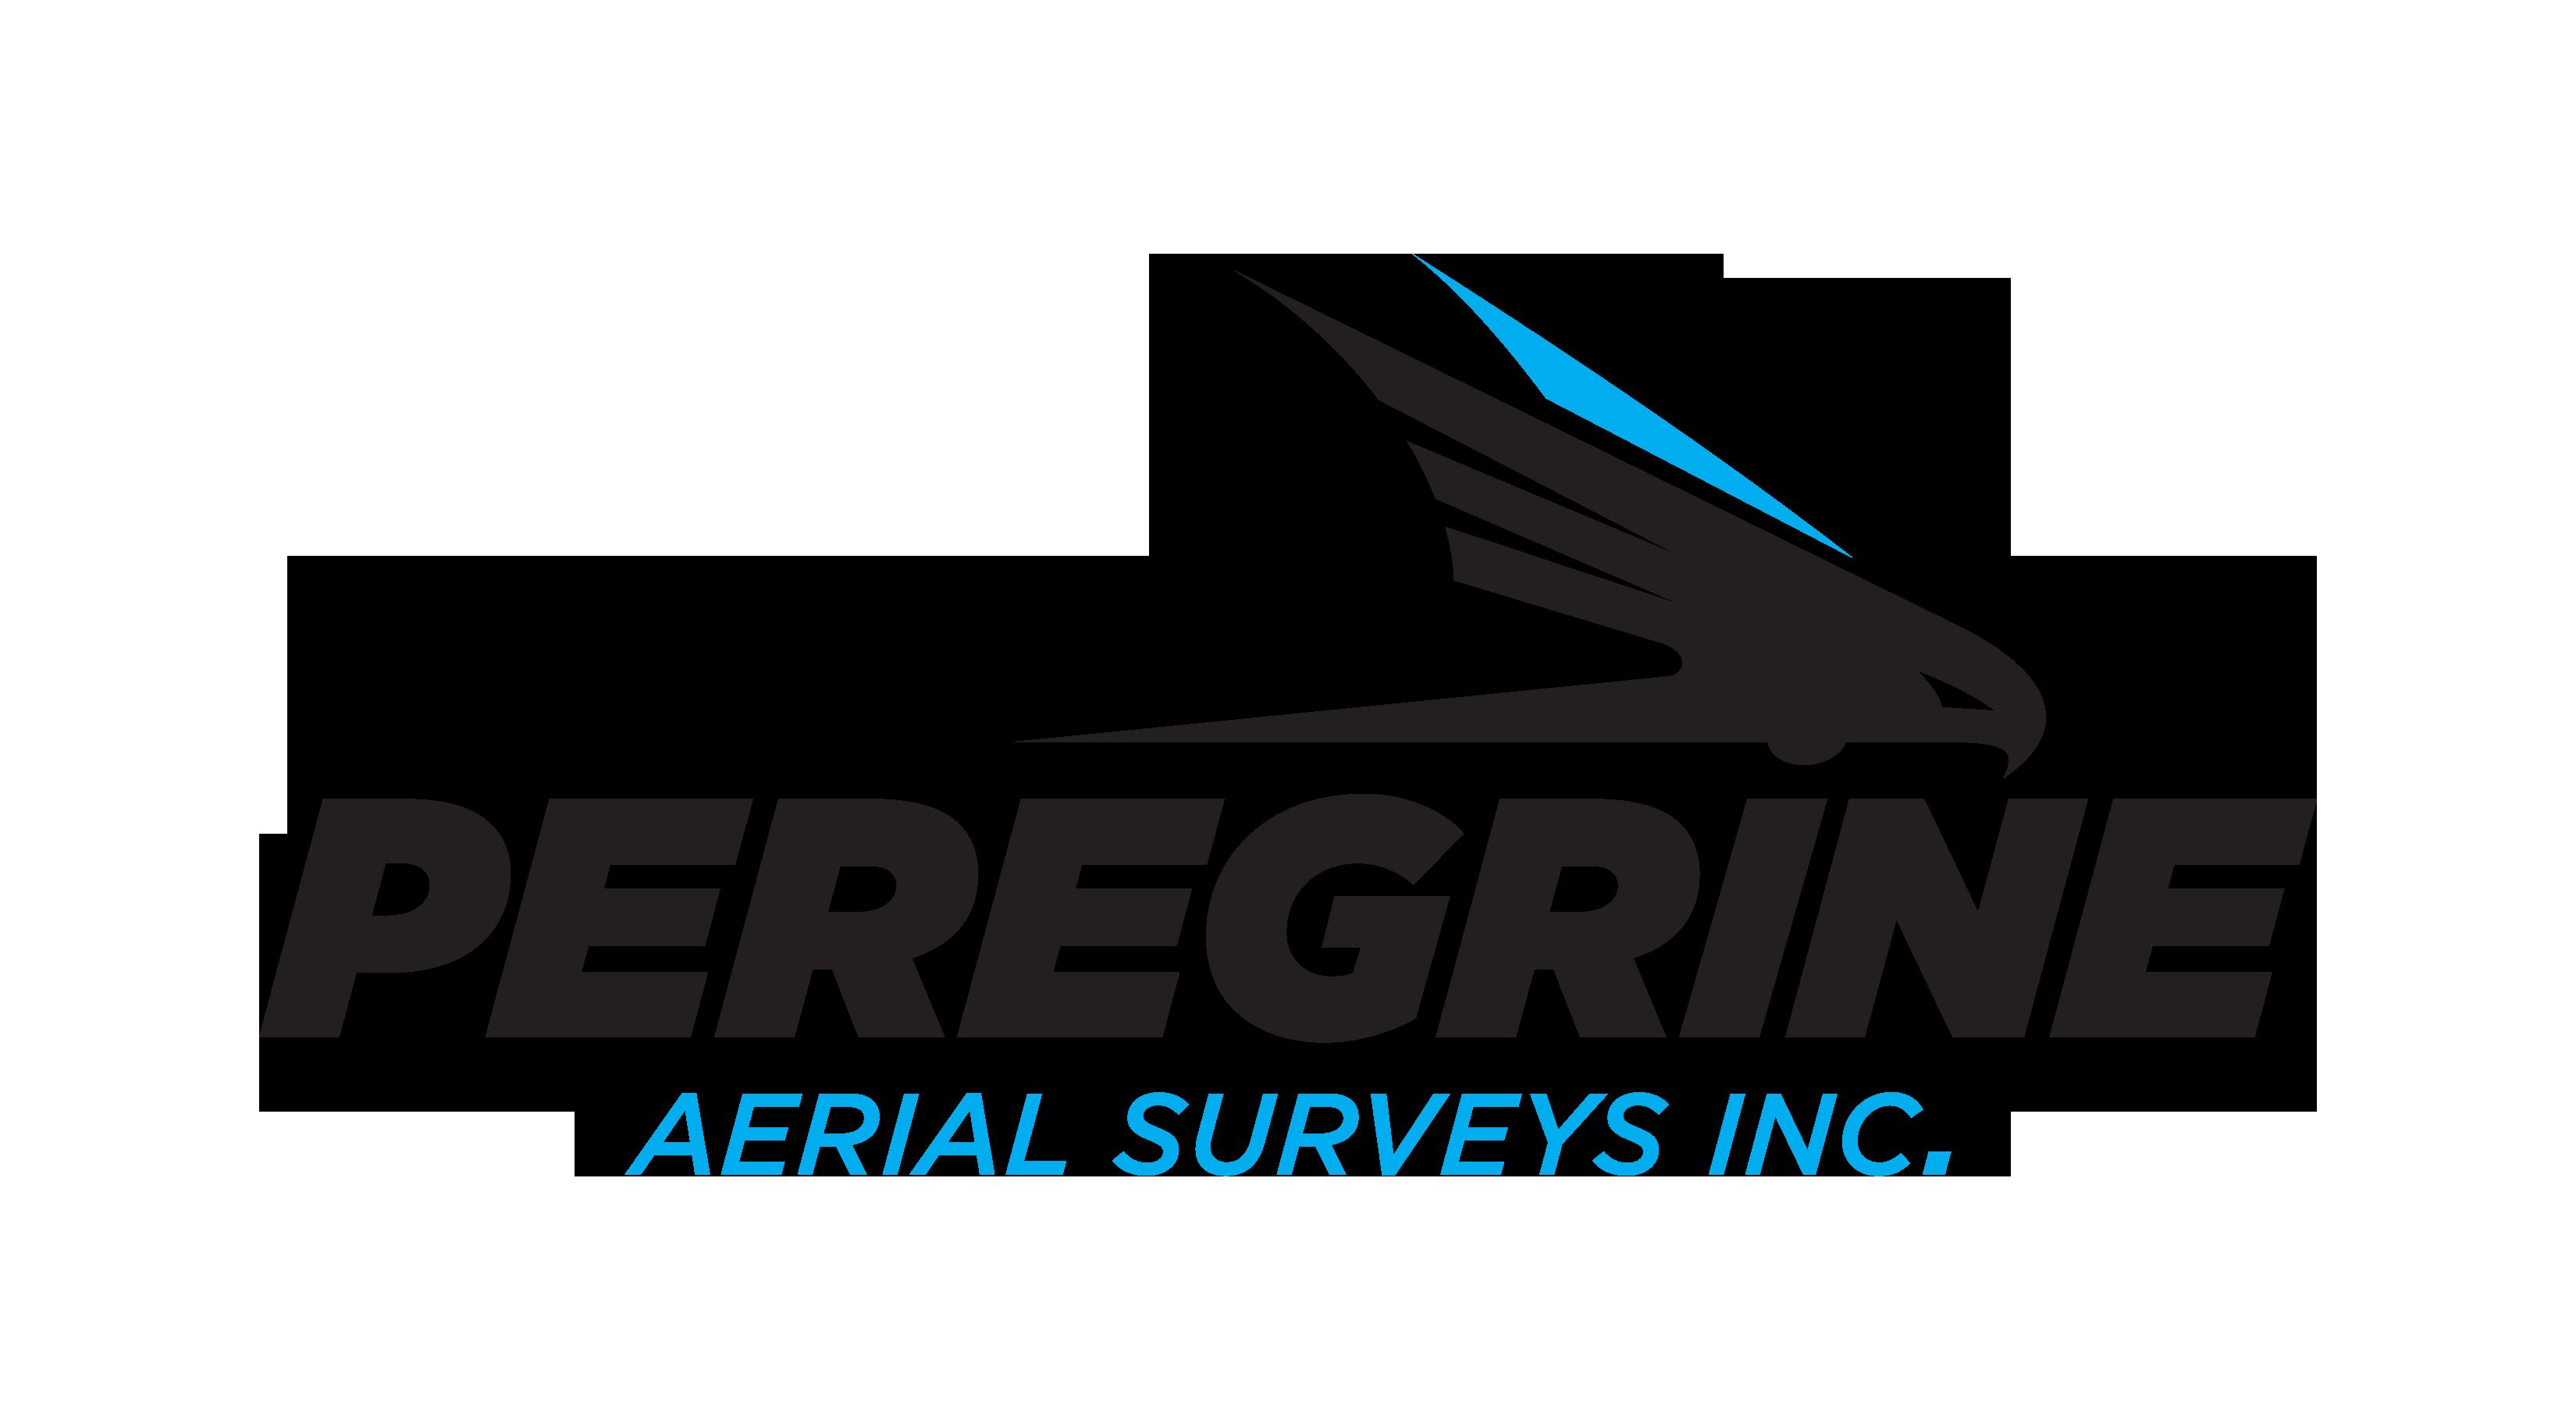 Peregrine Aerial Surveys | Digital Mapping Services